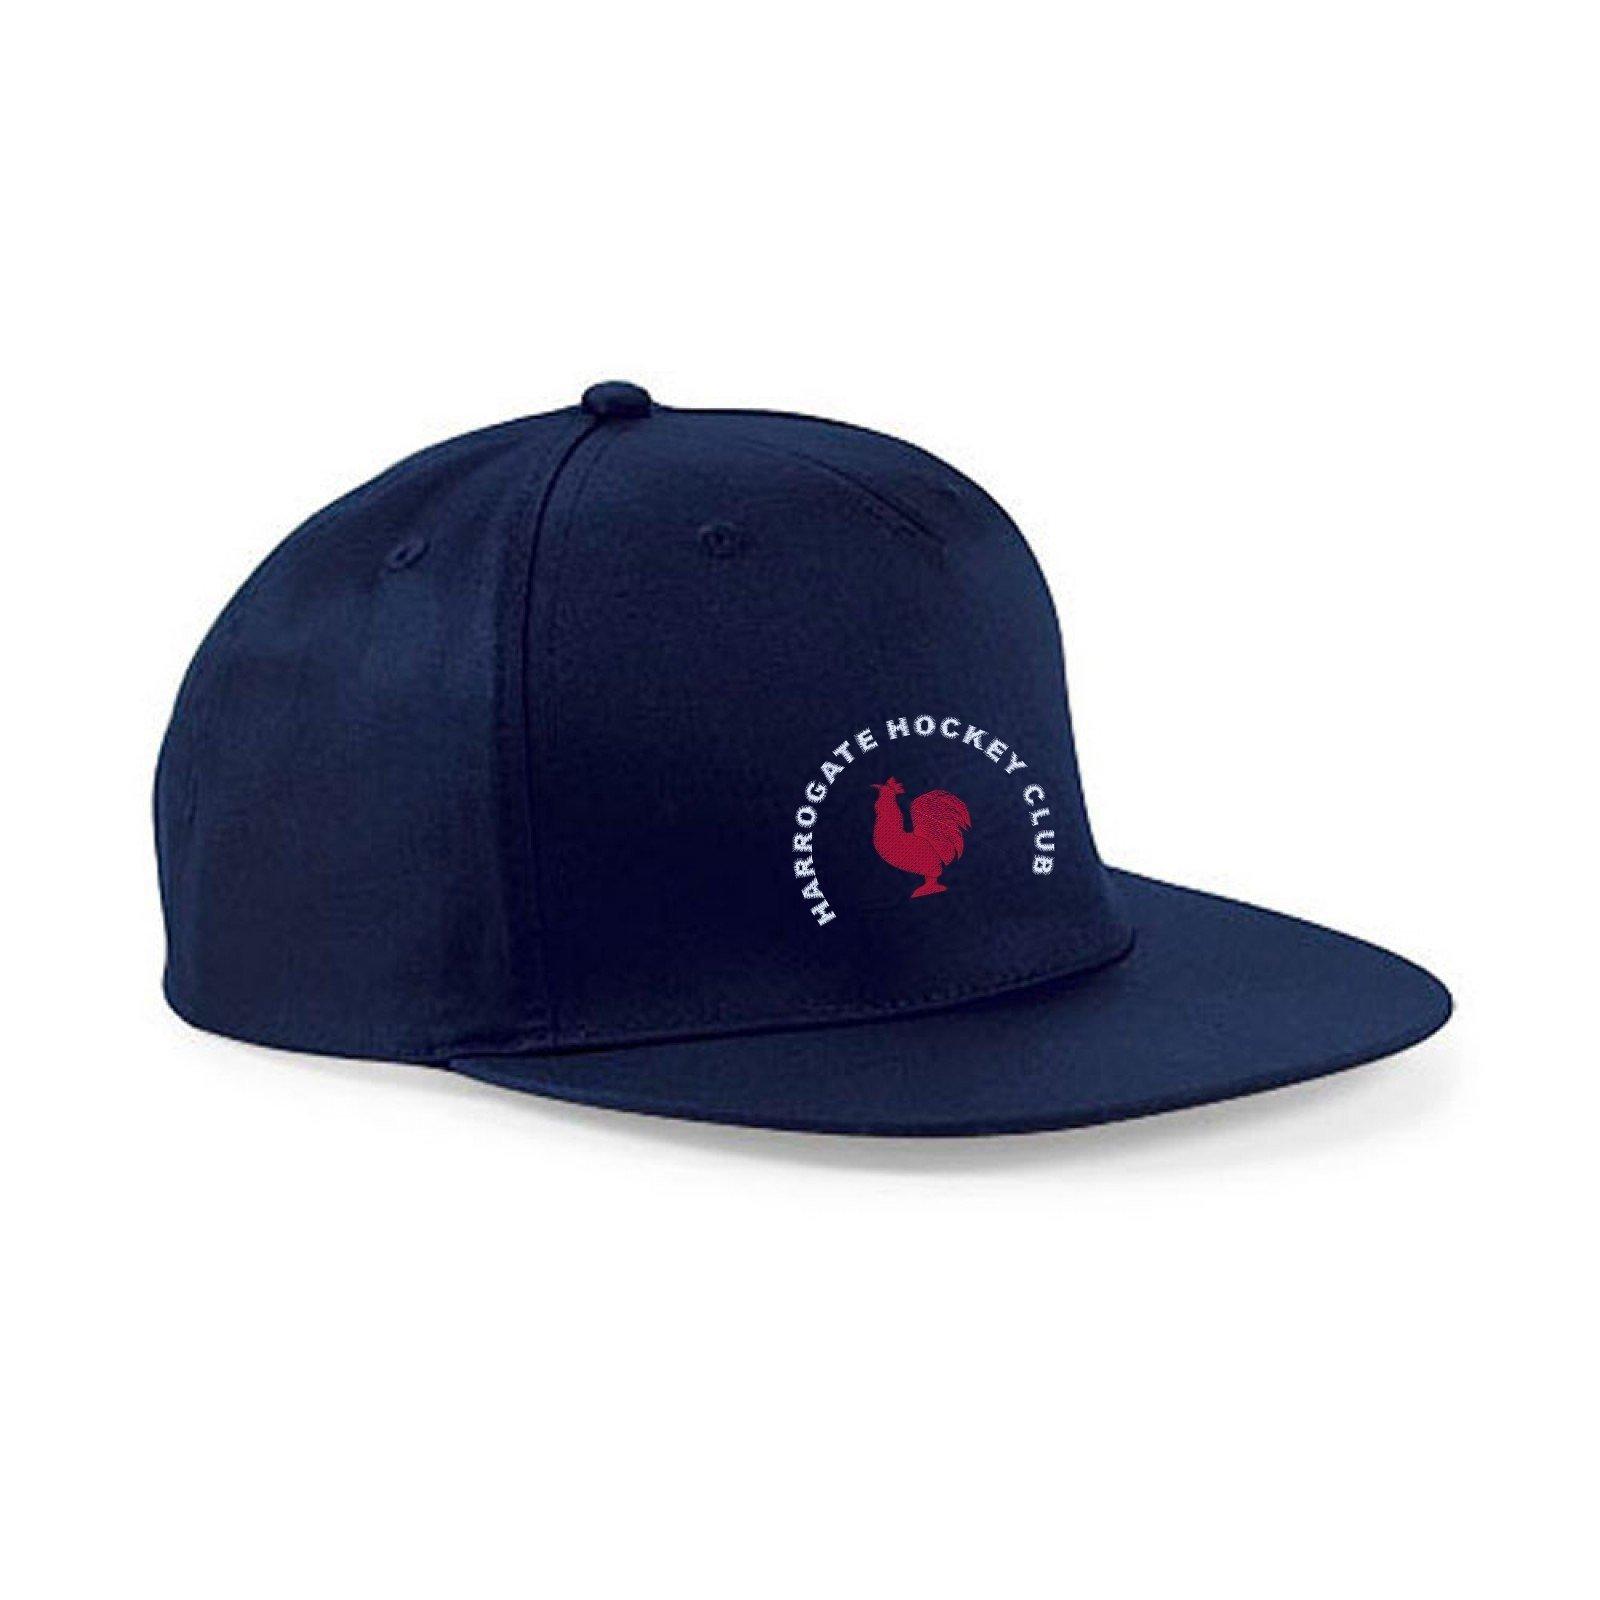 Harrogate HC Adidas Navy Snapback Hat